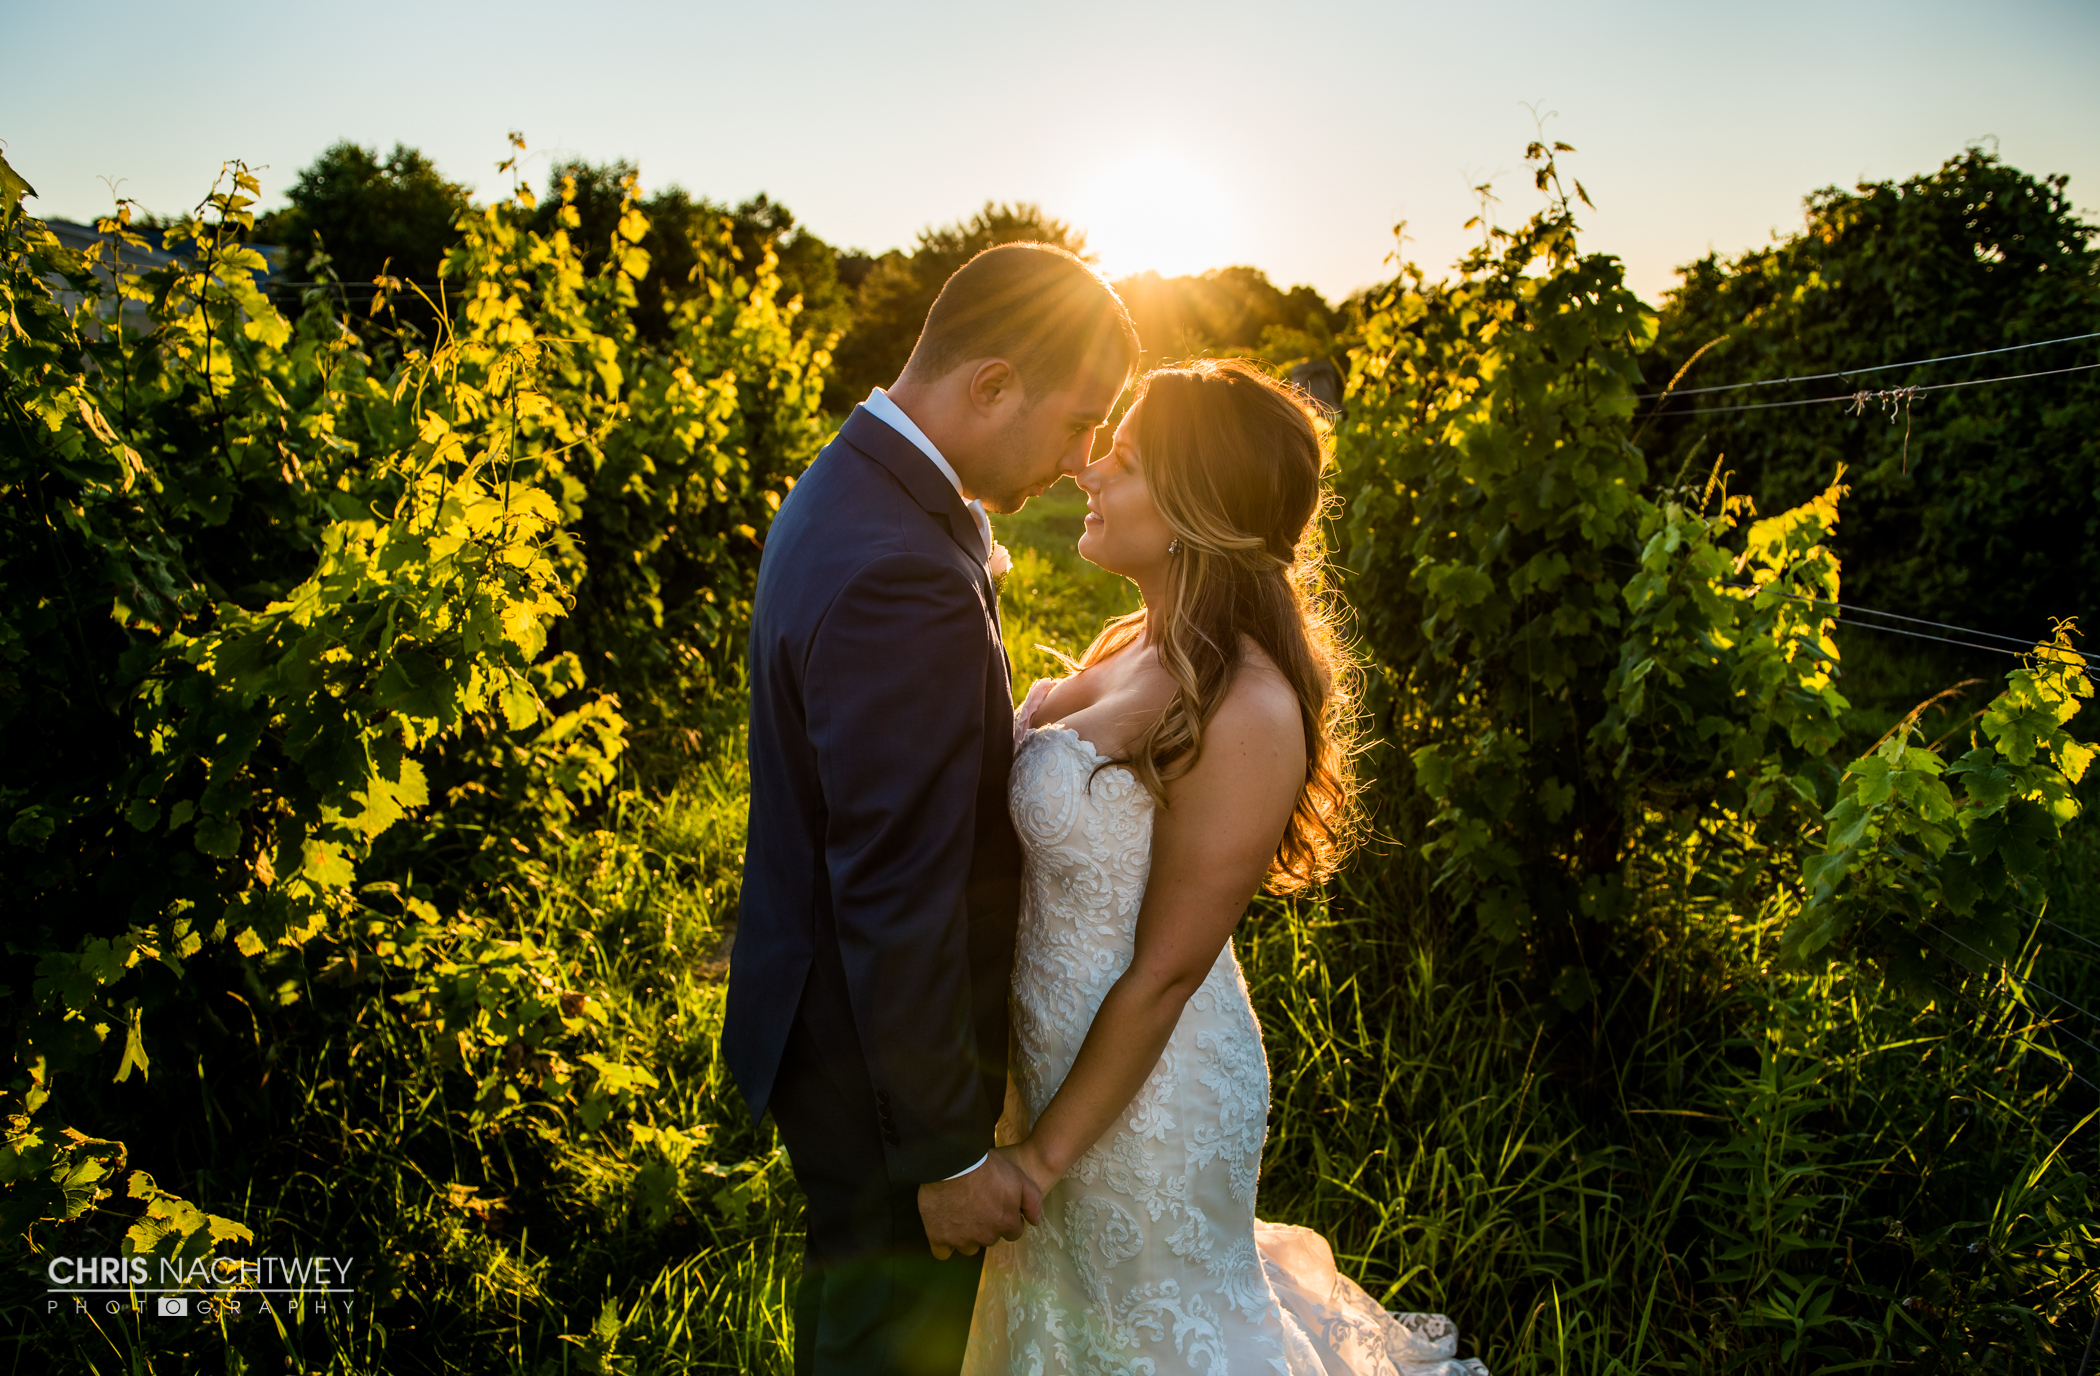 saltwater-farm-vineyard-wedding-photos-lindsay-gabe-chris-nachtwey-photography-2017-48.jpg